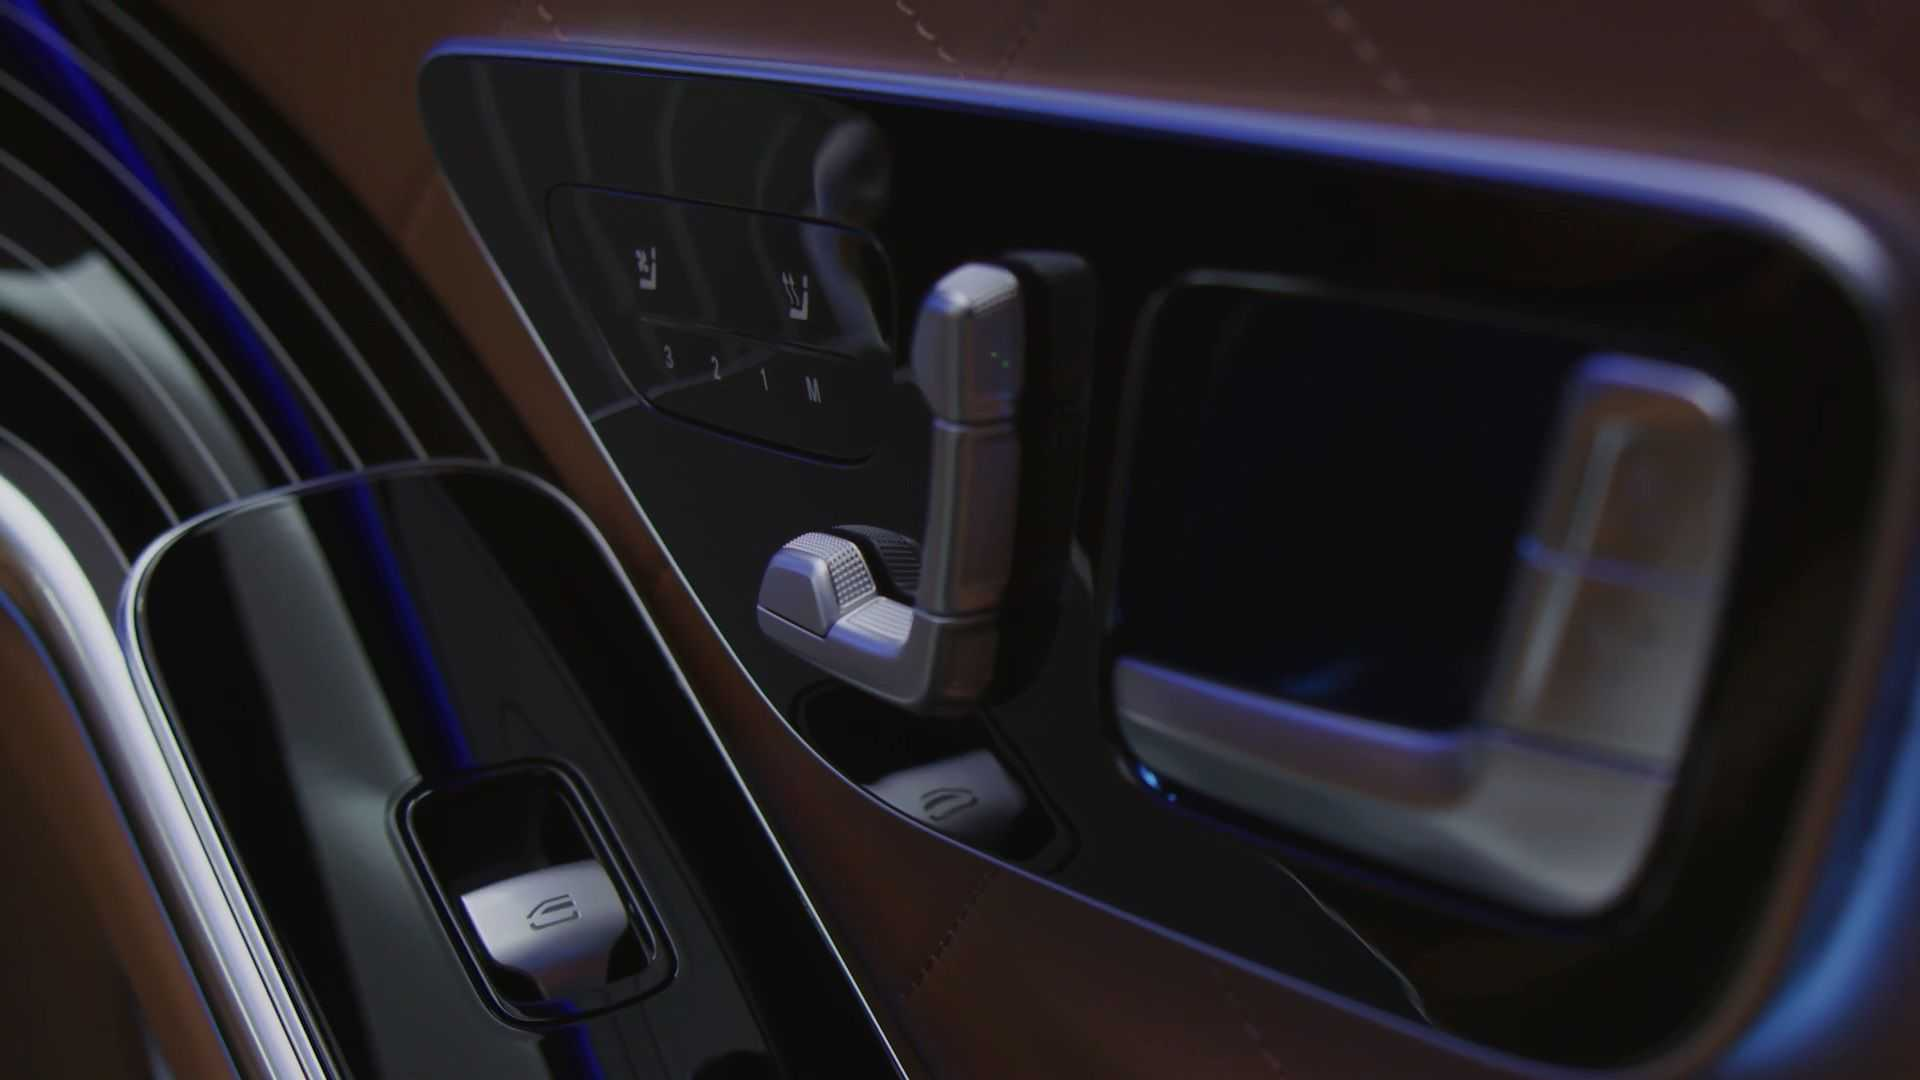 2021-mercedes-s-class-interior-11